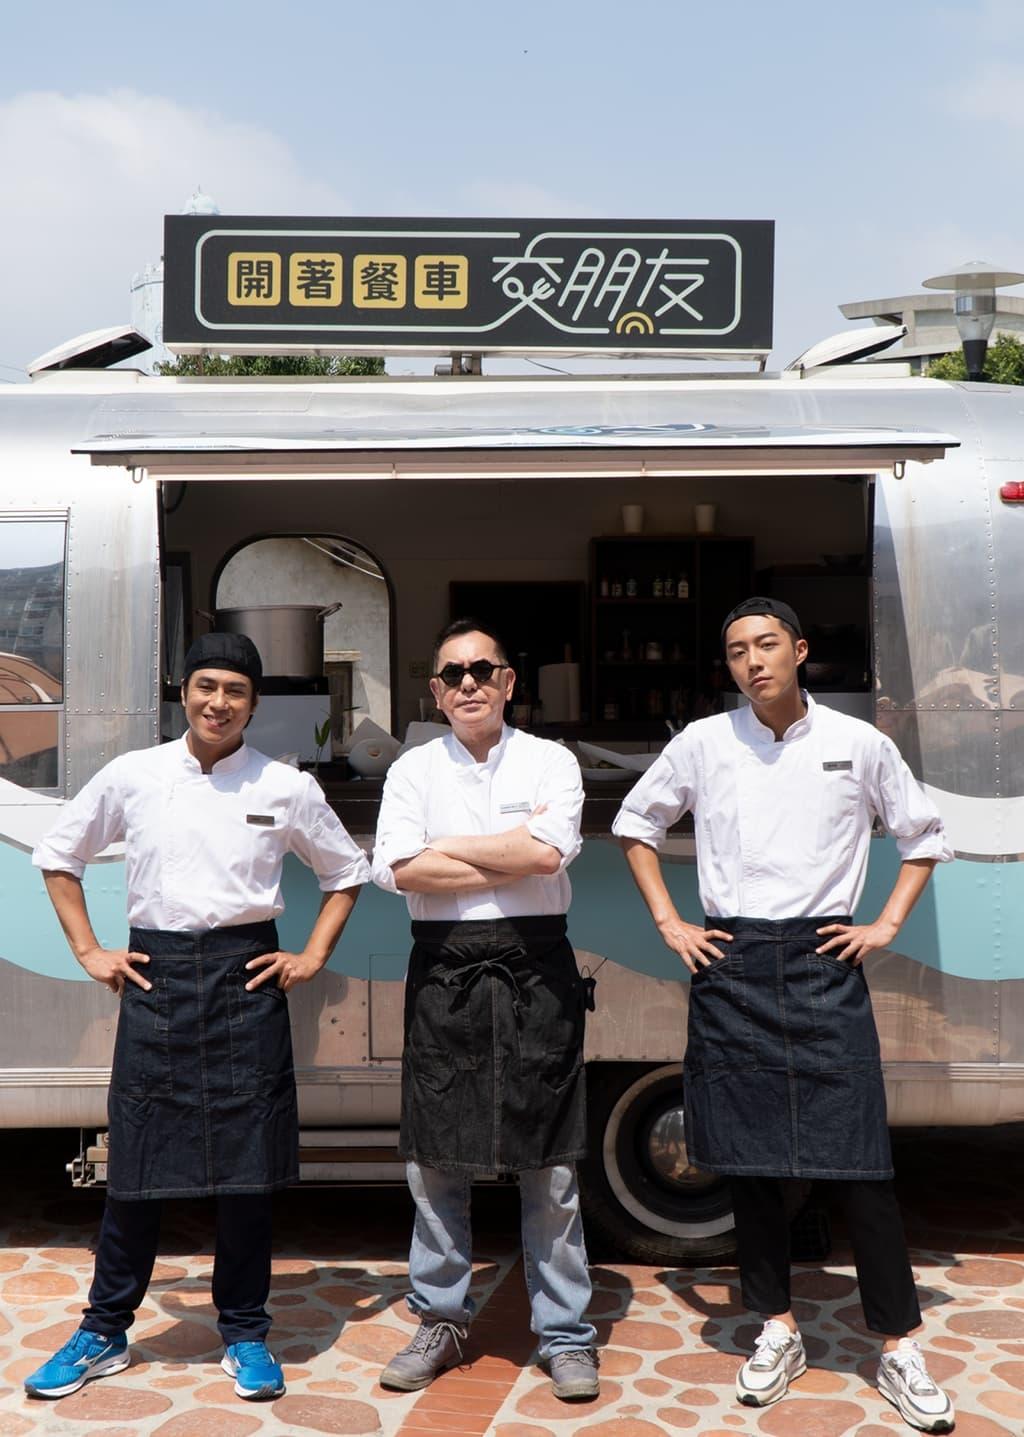 Friends by Food Truck